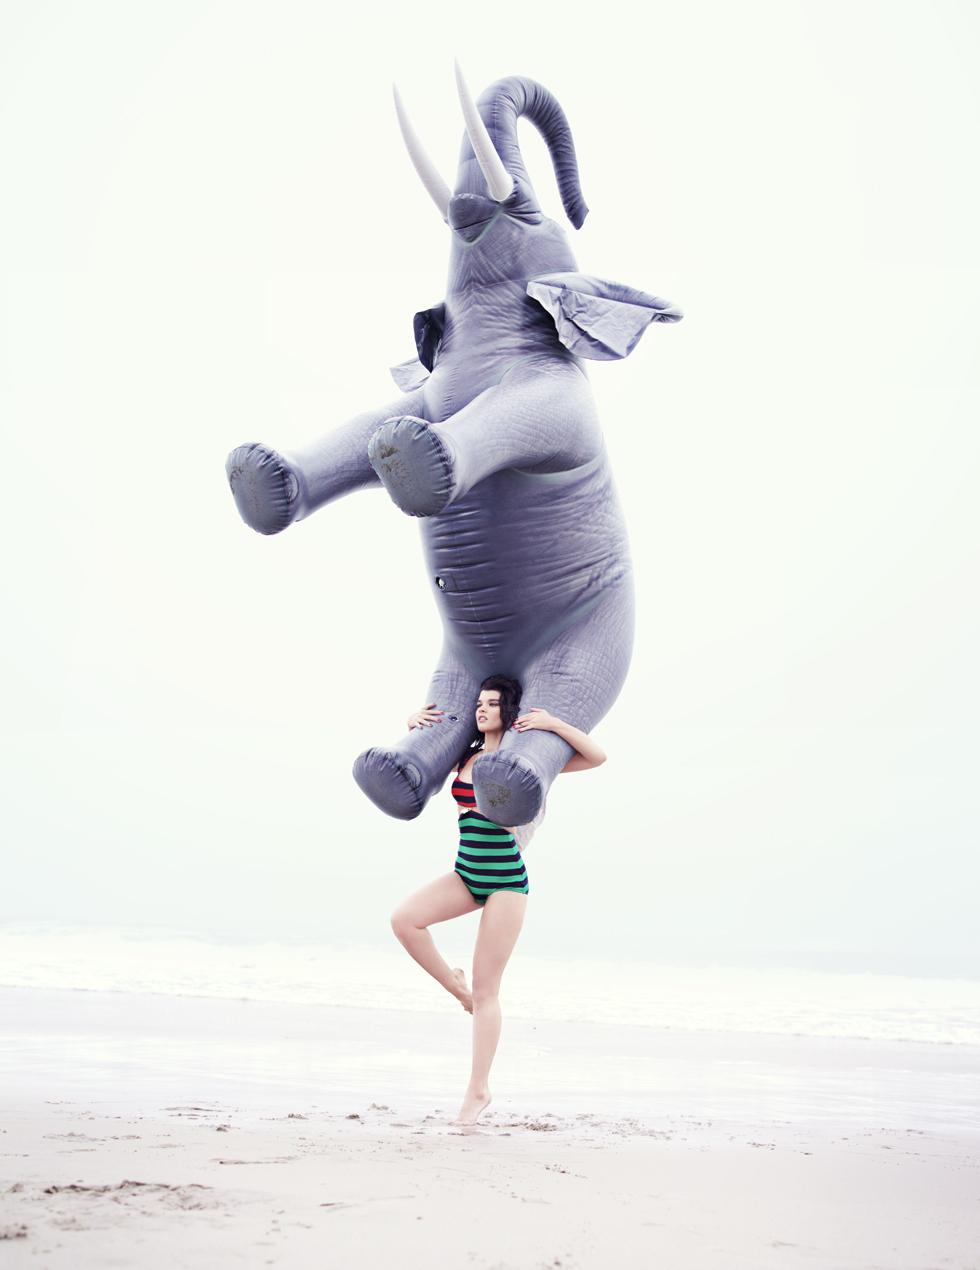 Картинки по запроÑу jumping